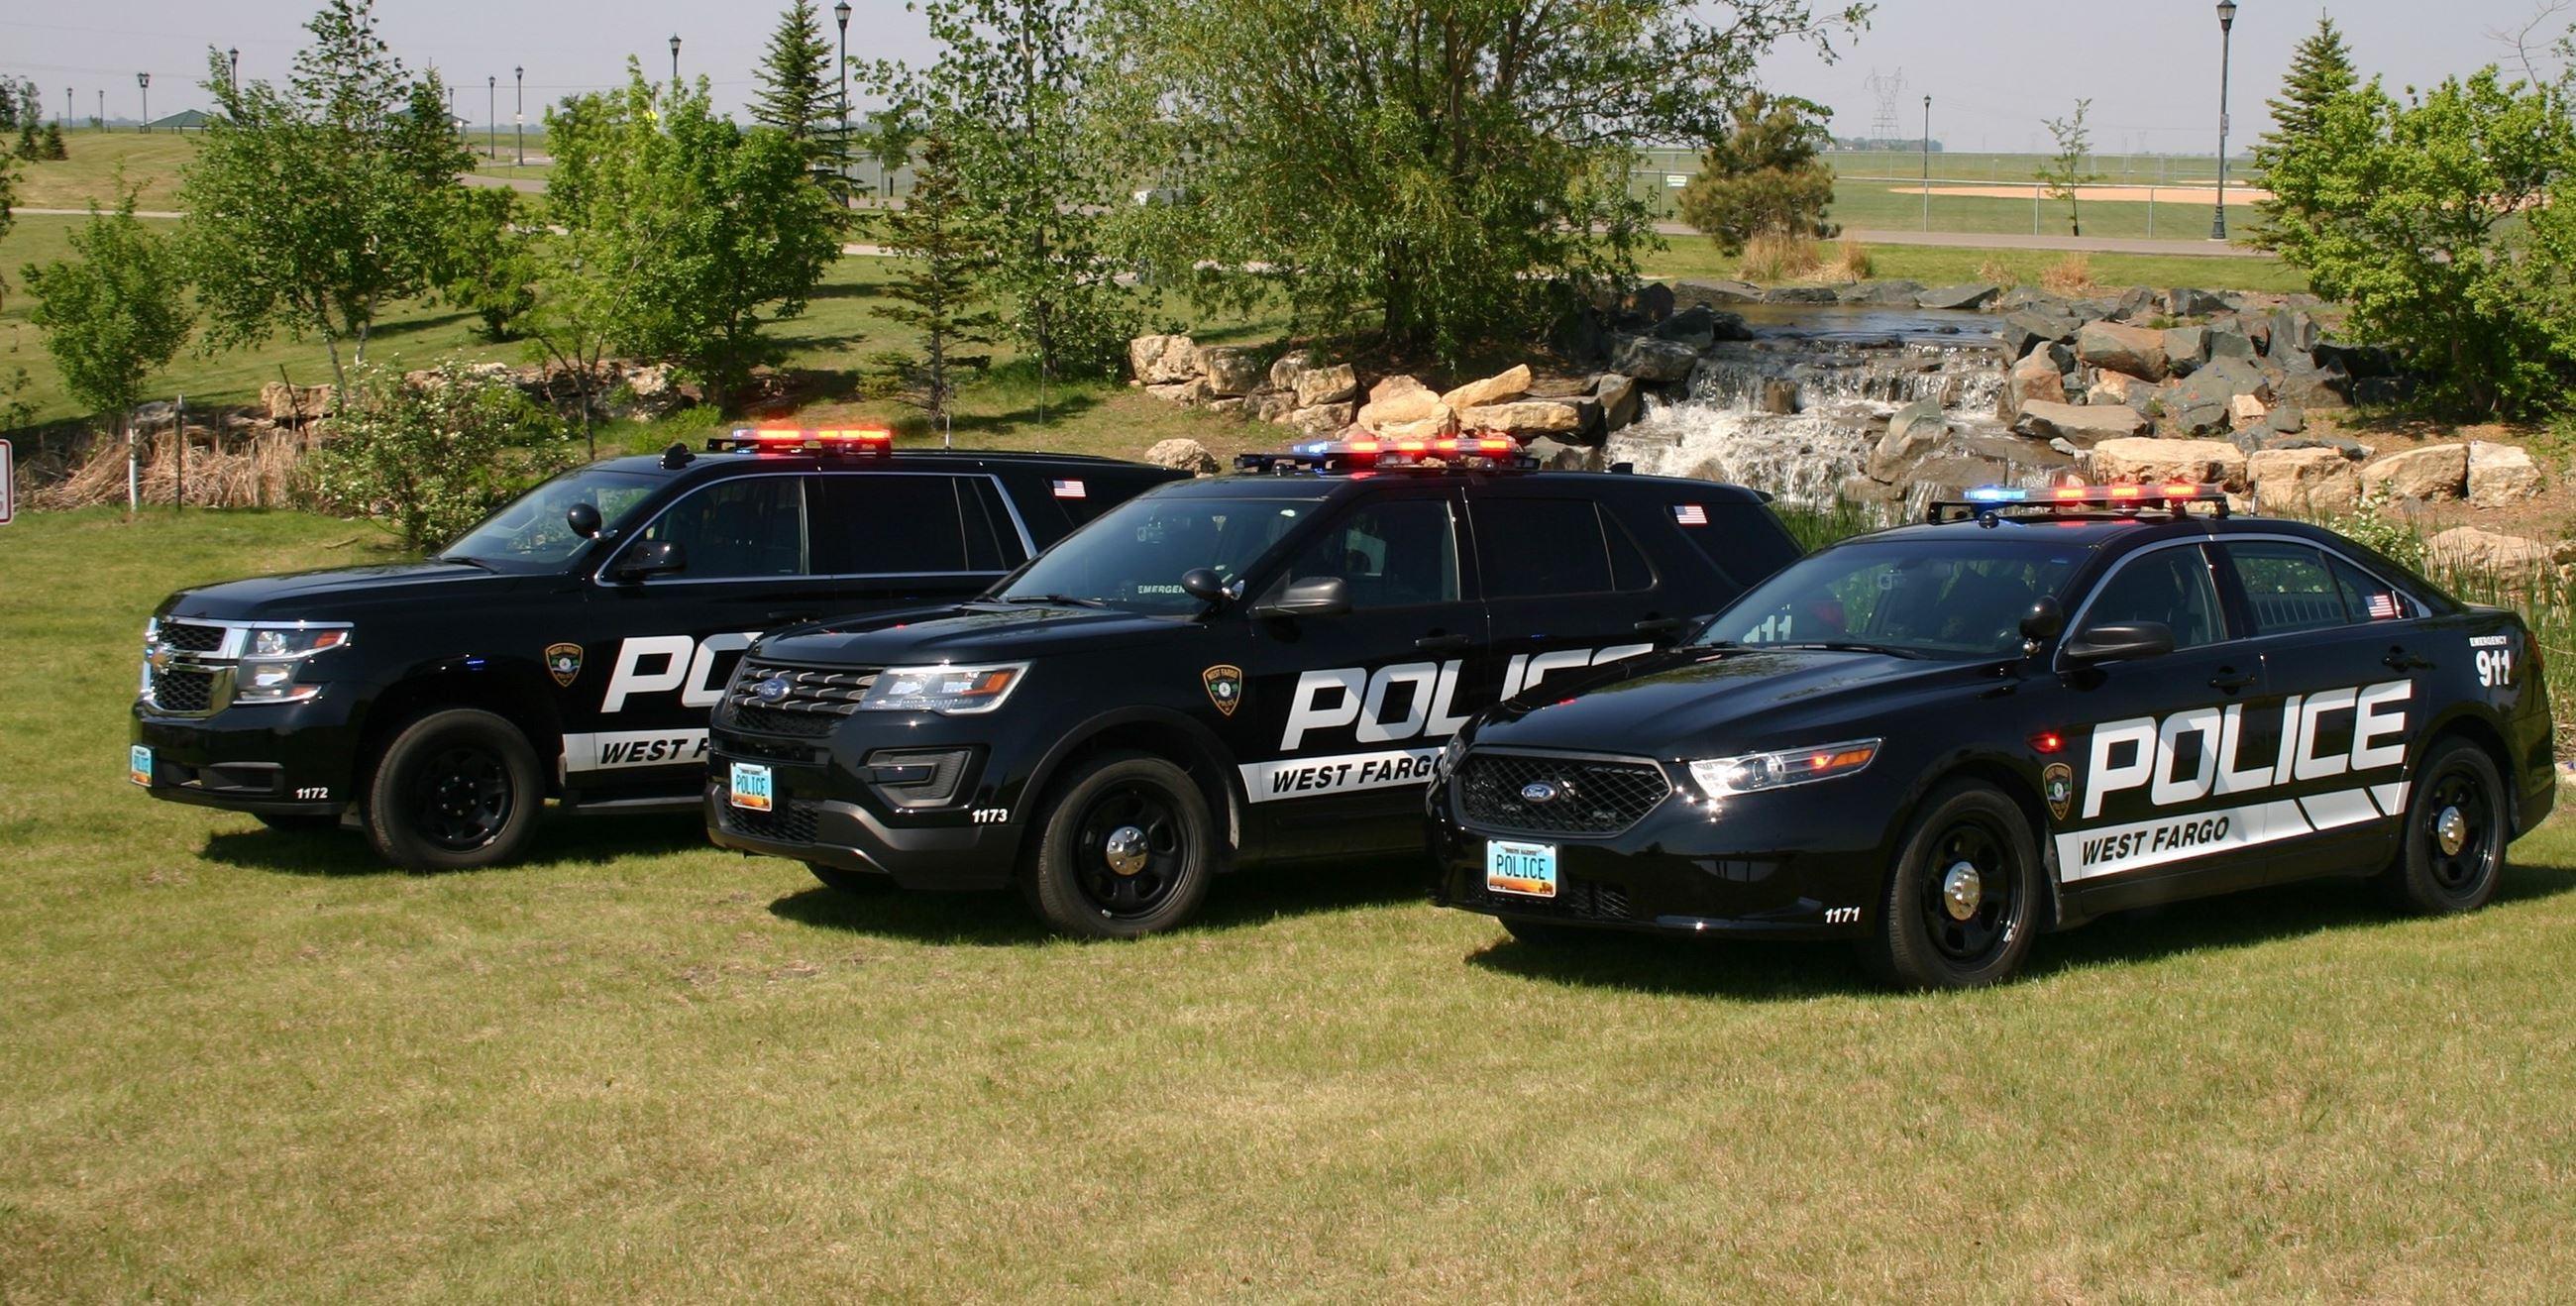 Police   West Fargo, ND